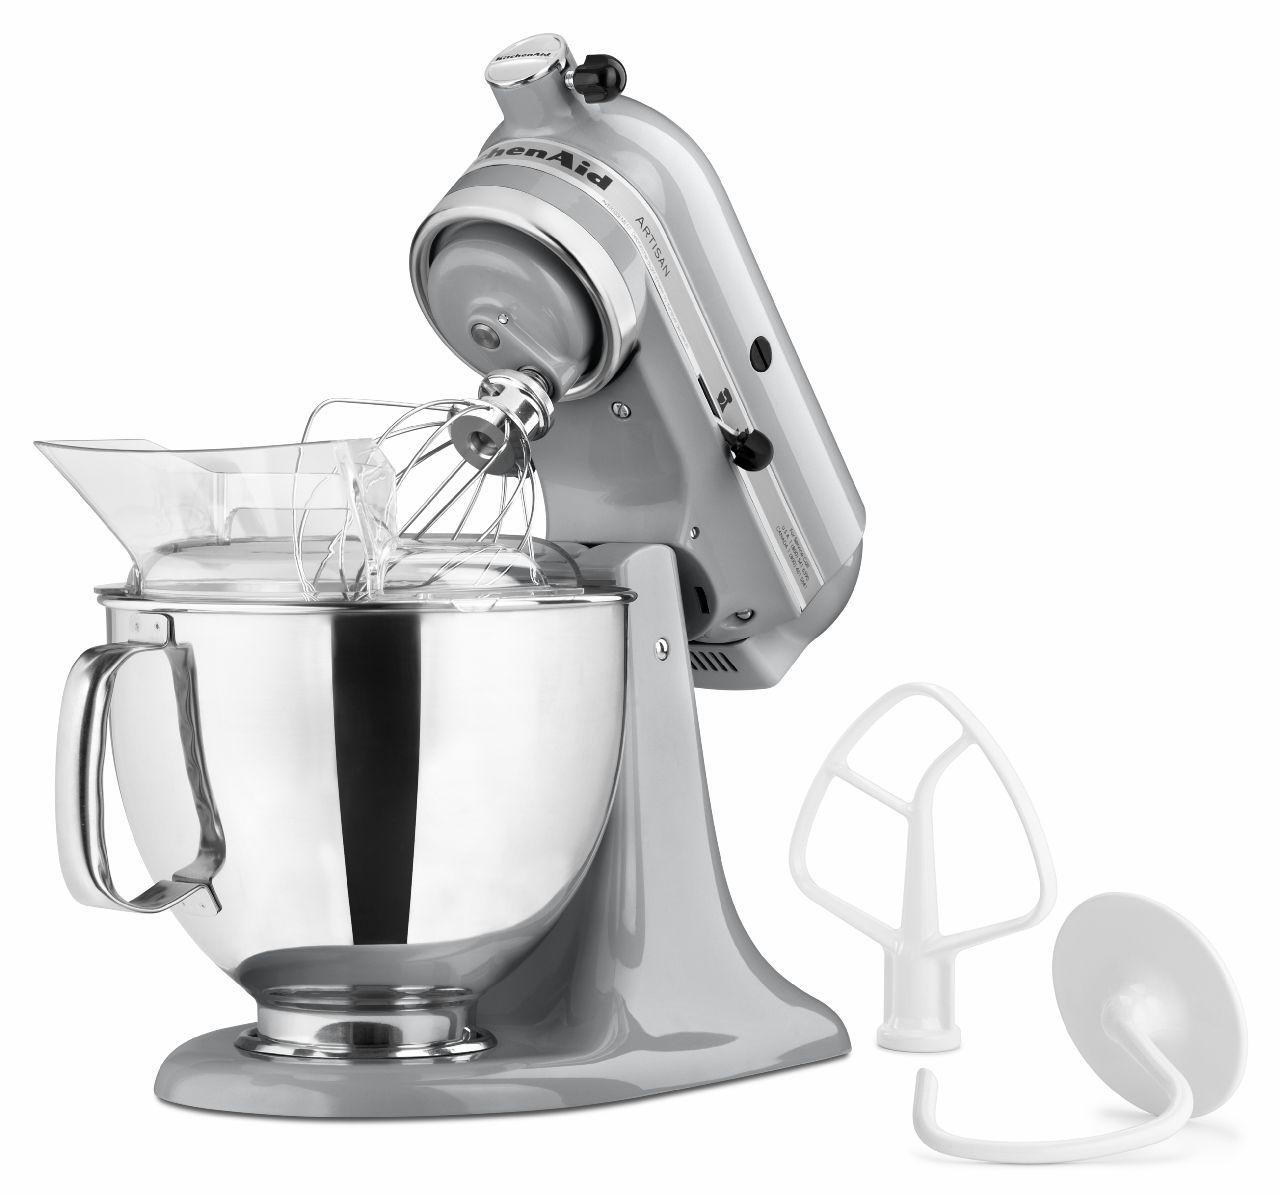 KitchenAid-Artisan-Series-5-Quart-Tilt-Head-Stand-Mixer-10-Speeds-KSM150PS thumbnail 89